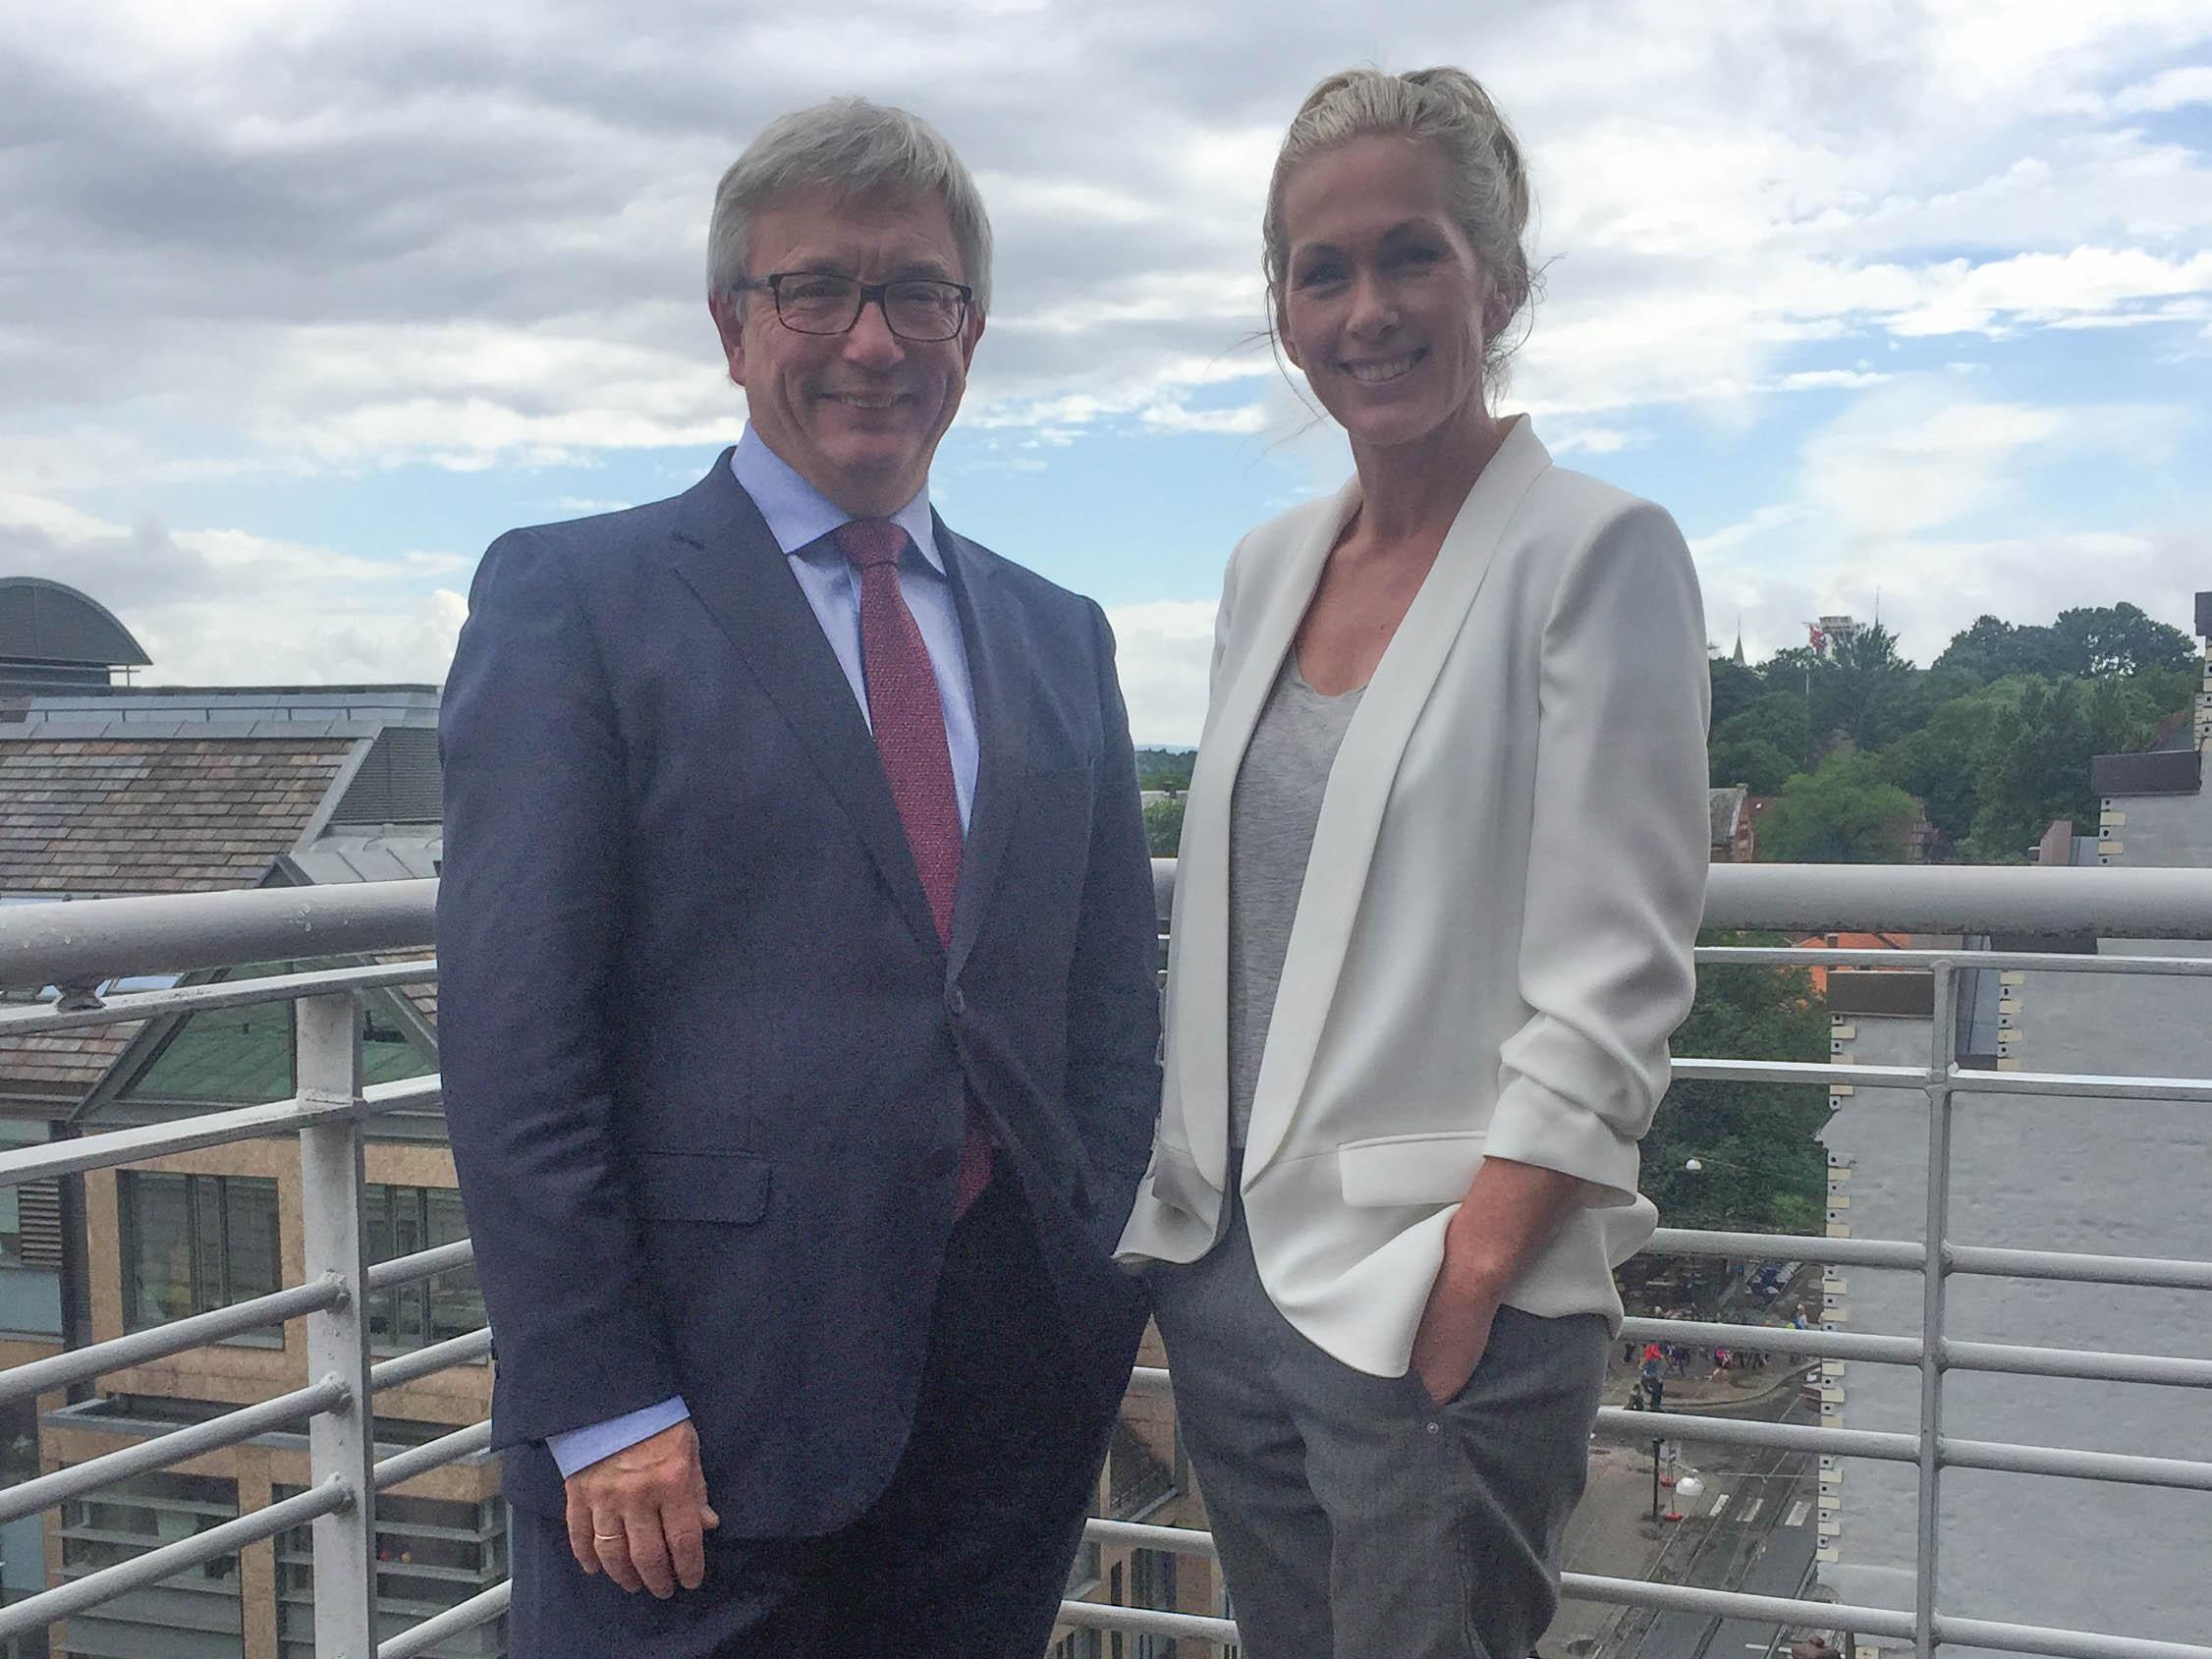 Karl Eirik Schjøtt-Pedersen and Anita Krohn Traaseth. Photo: Norwegian Oil and Gas Association